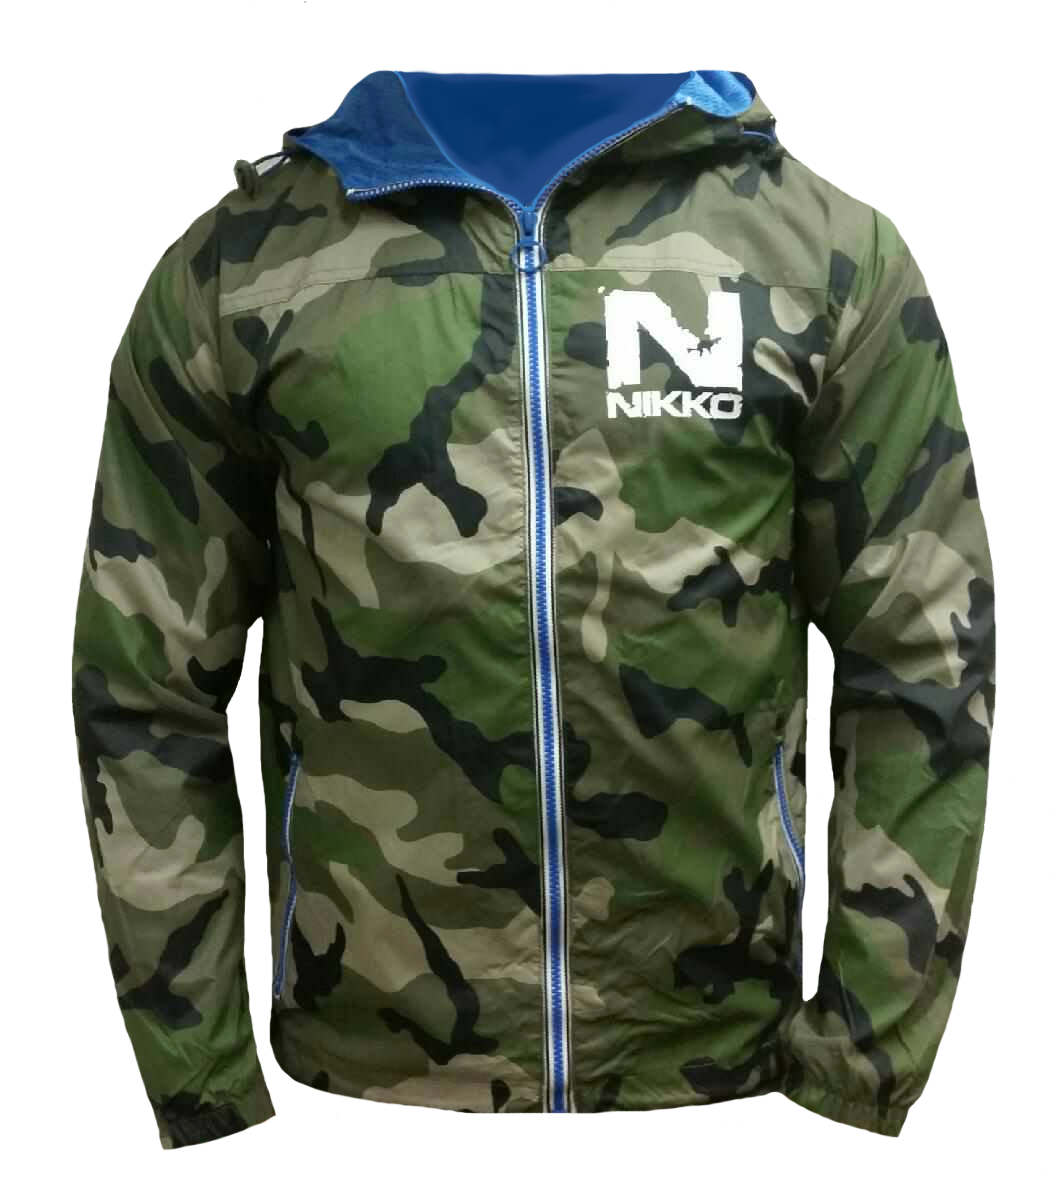 Nikko Camouflage Jas